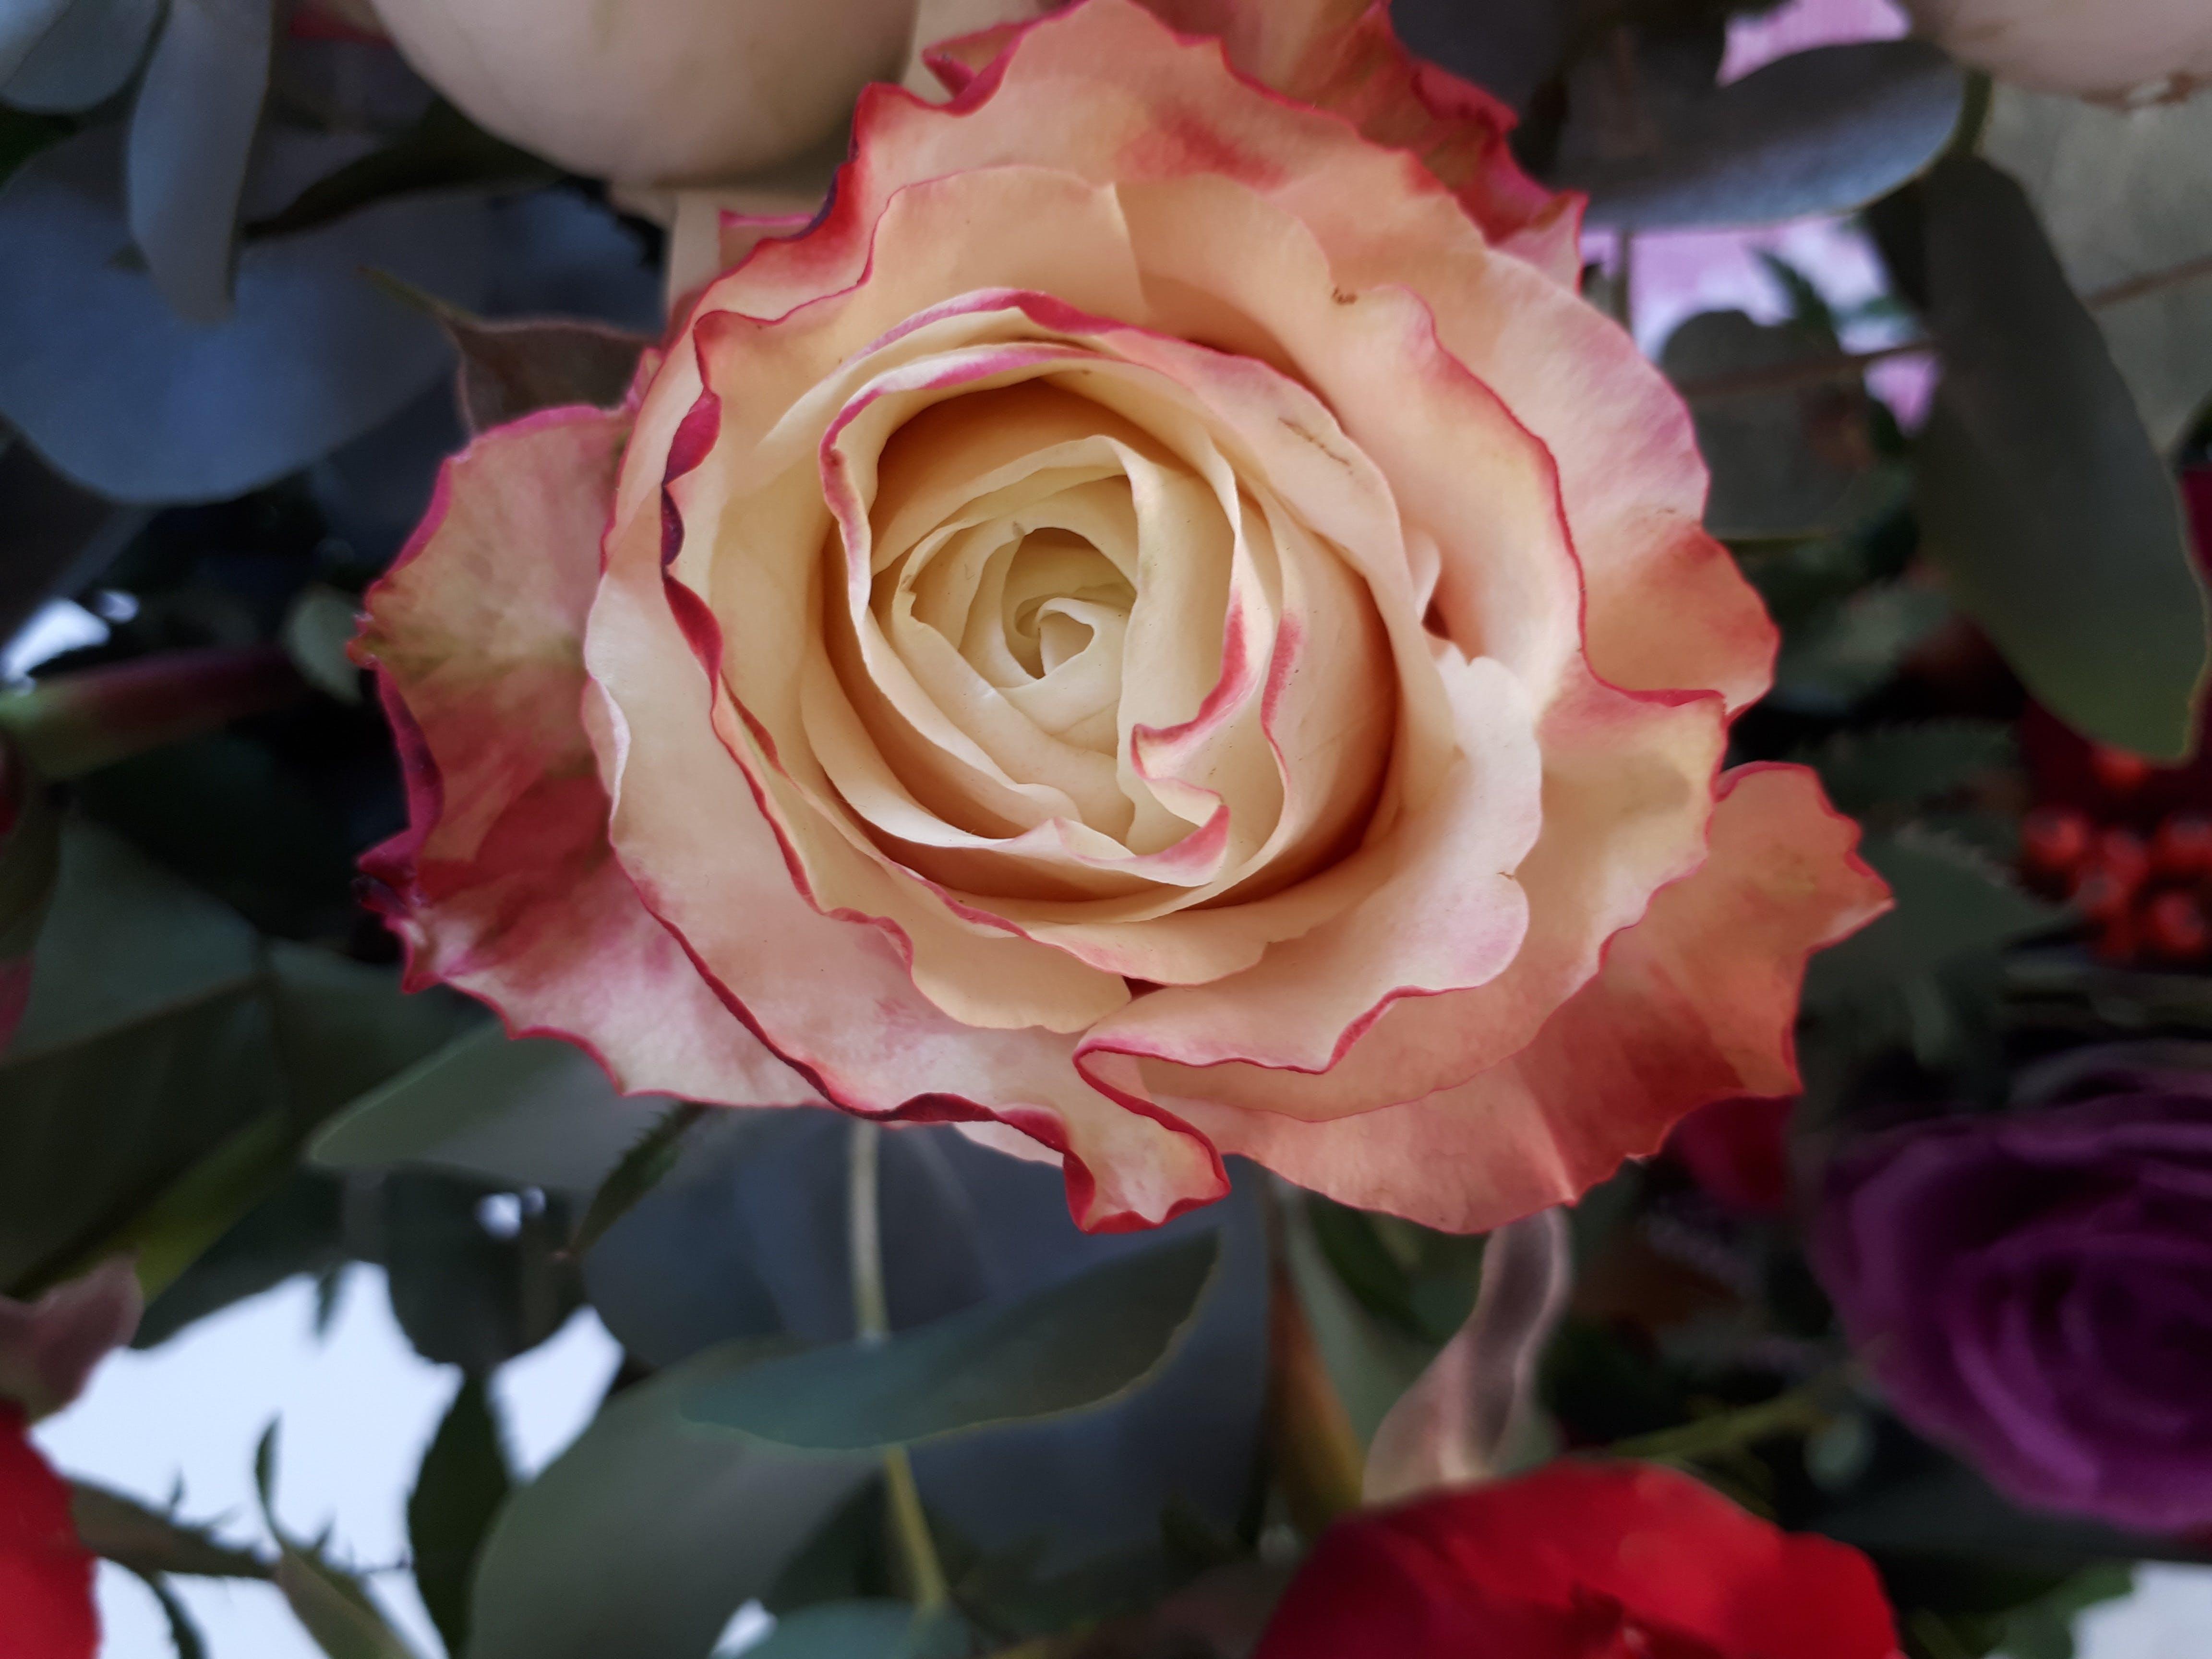 Free stock photo of rose